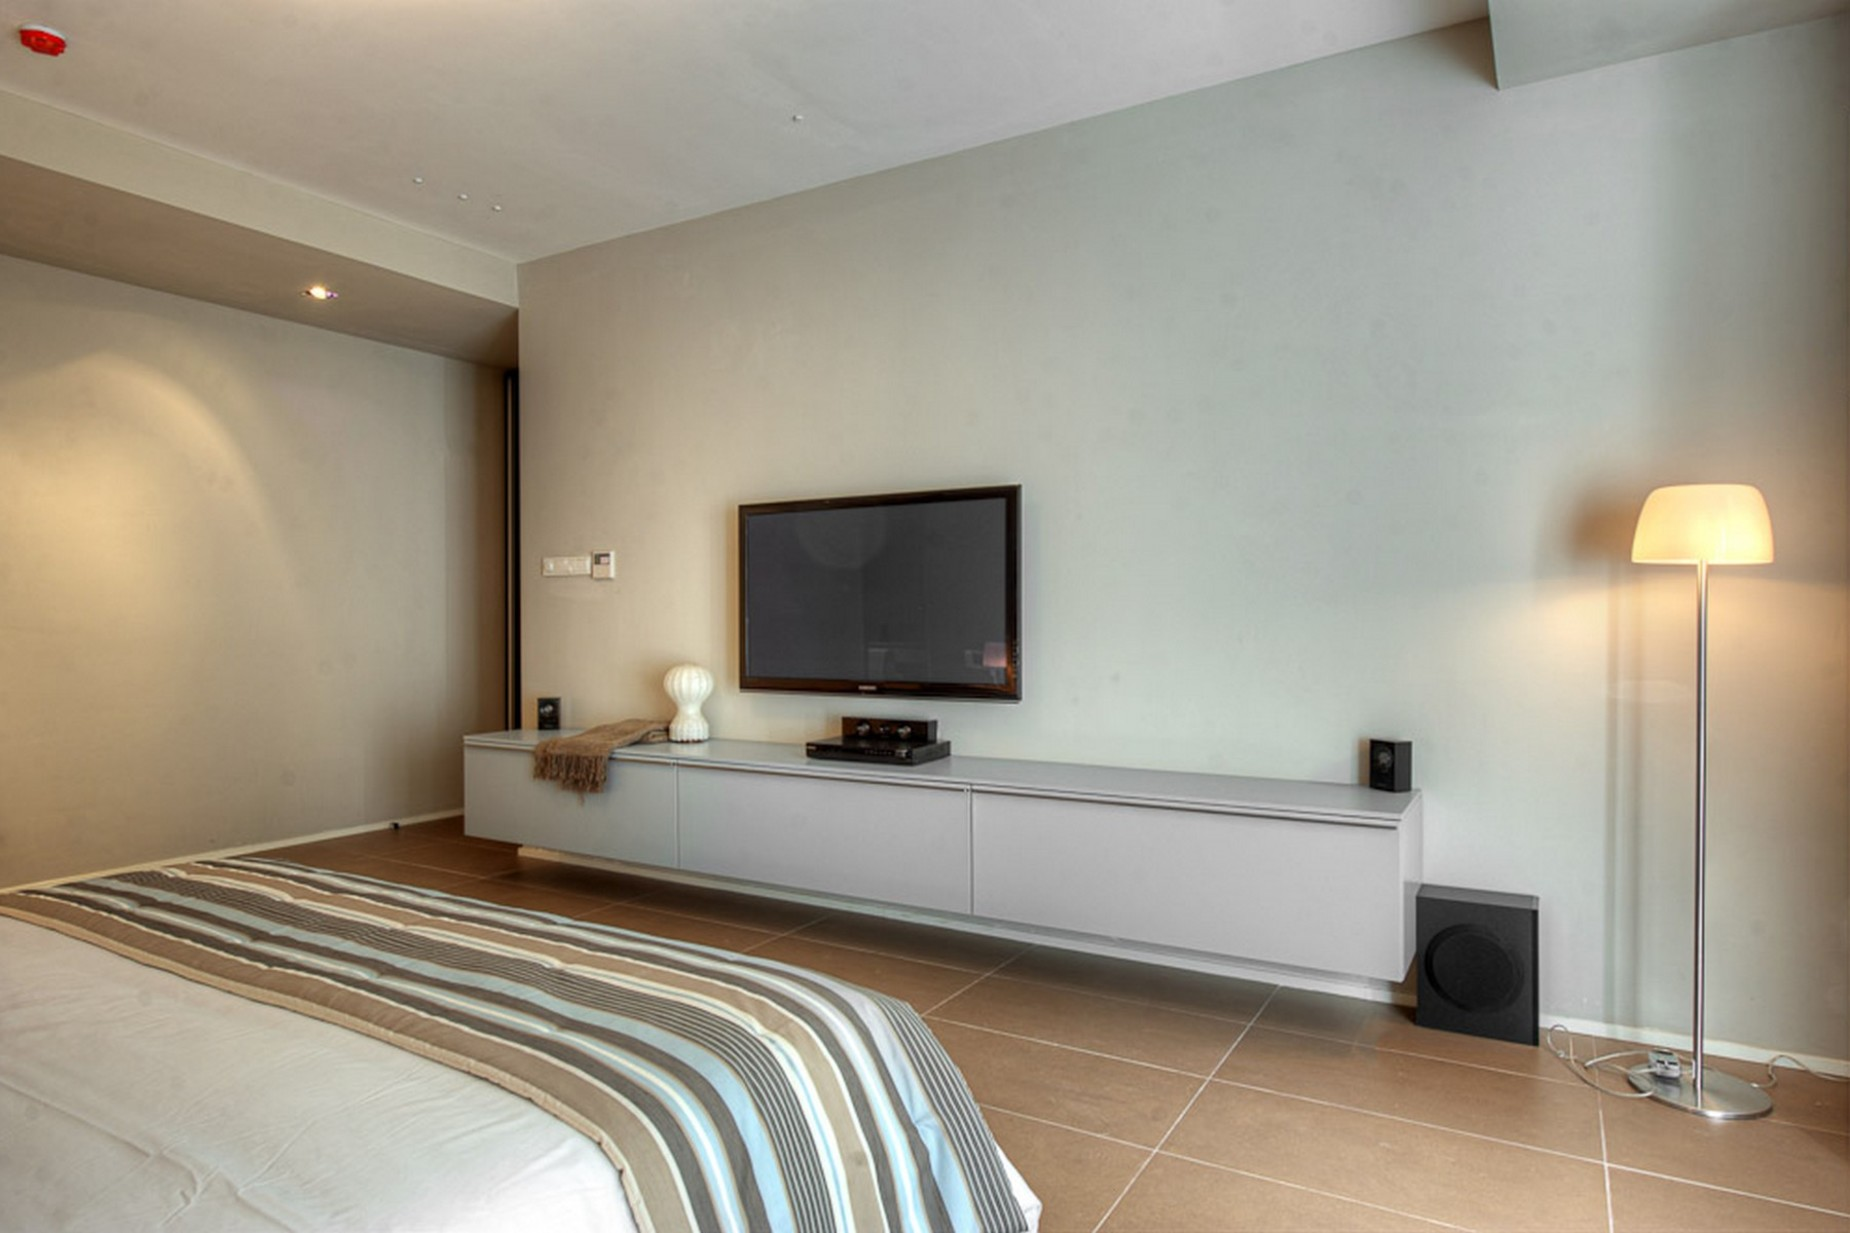 3 bed Villa For Sale in Bahar ic-Caghaq, Bahar ic-Caghaq - thumb 13